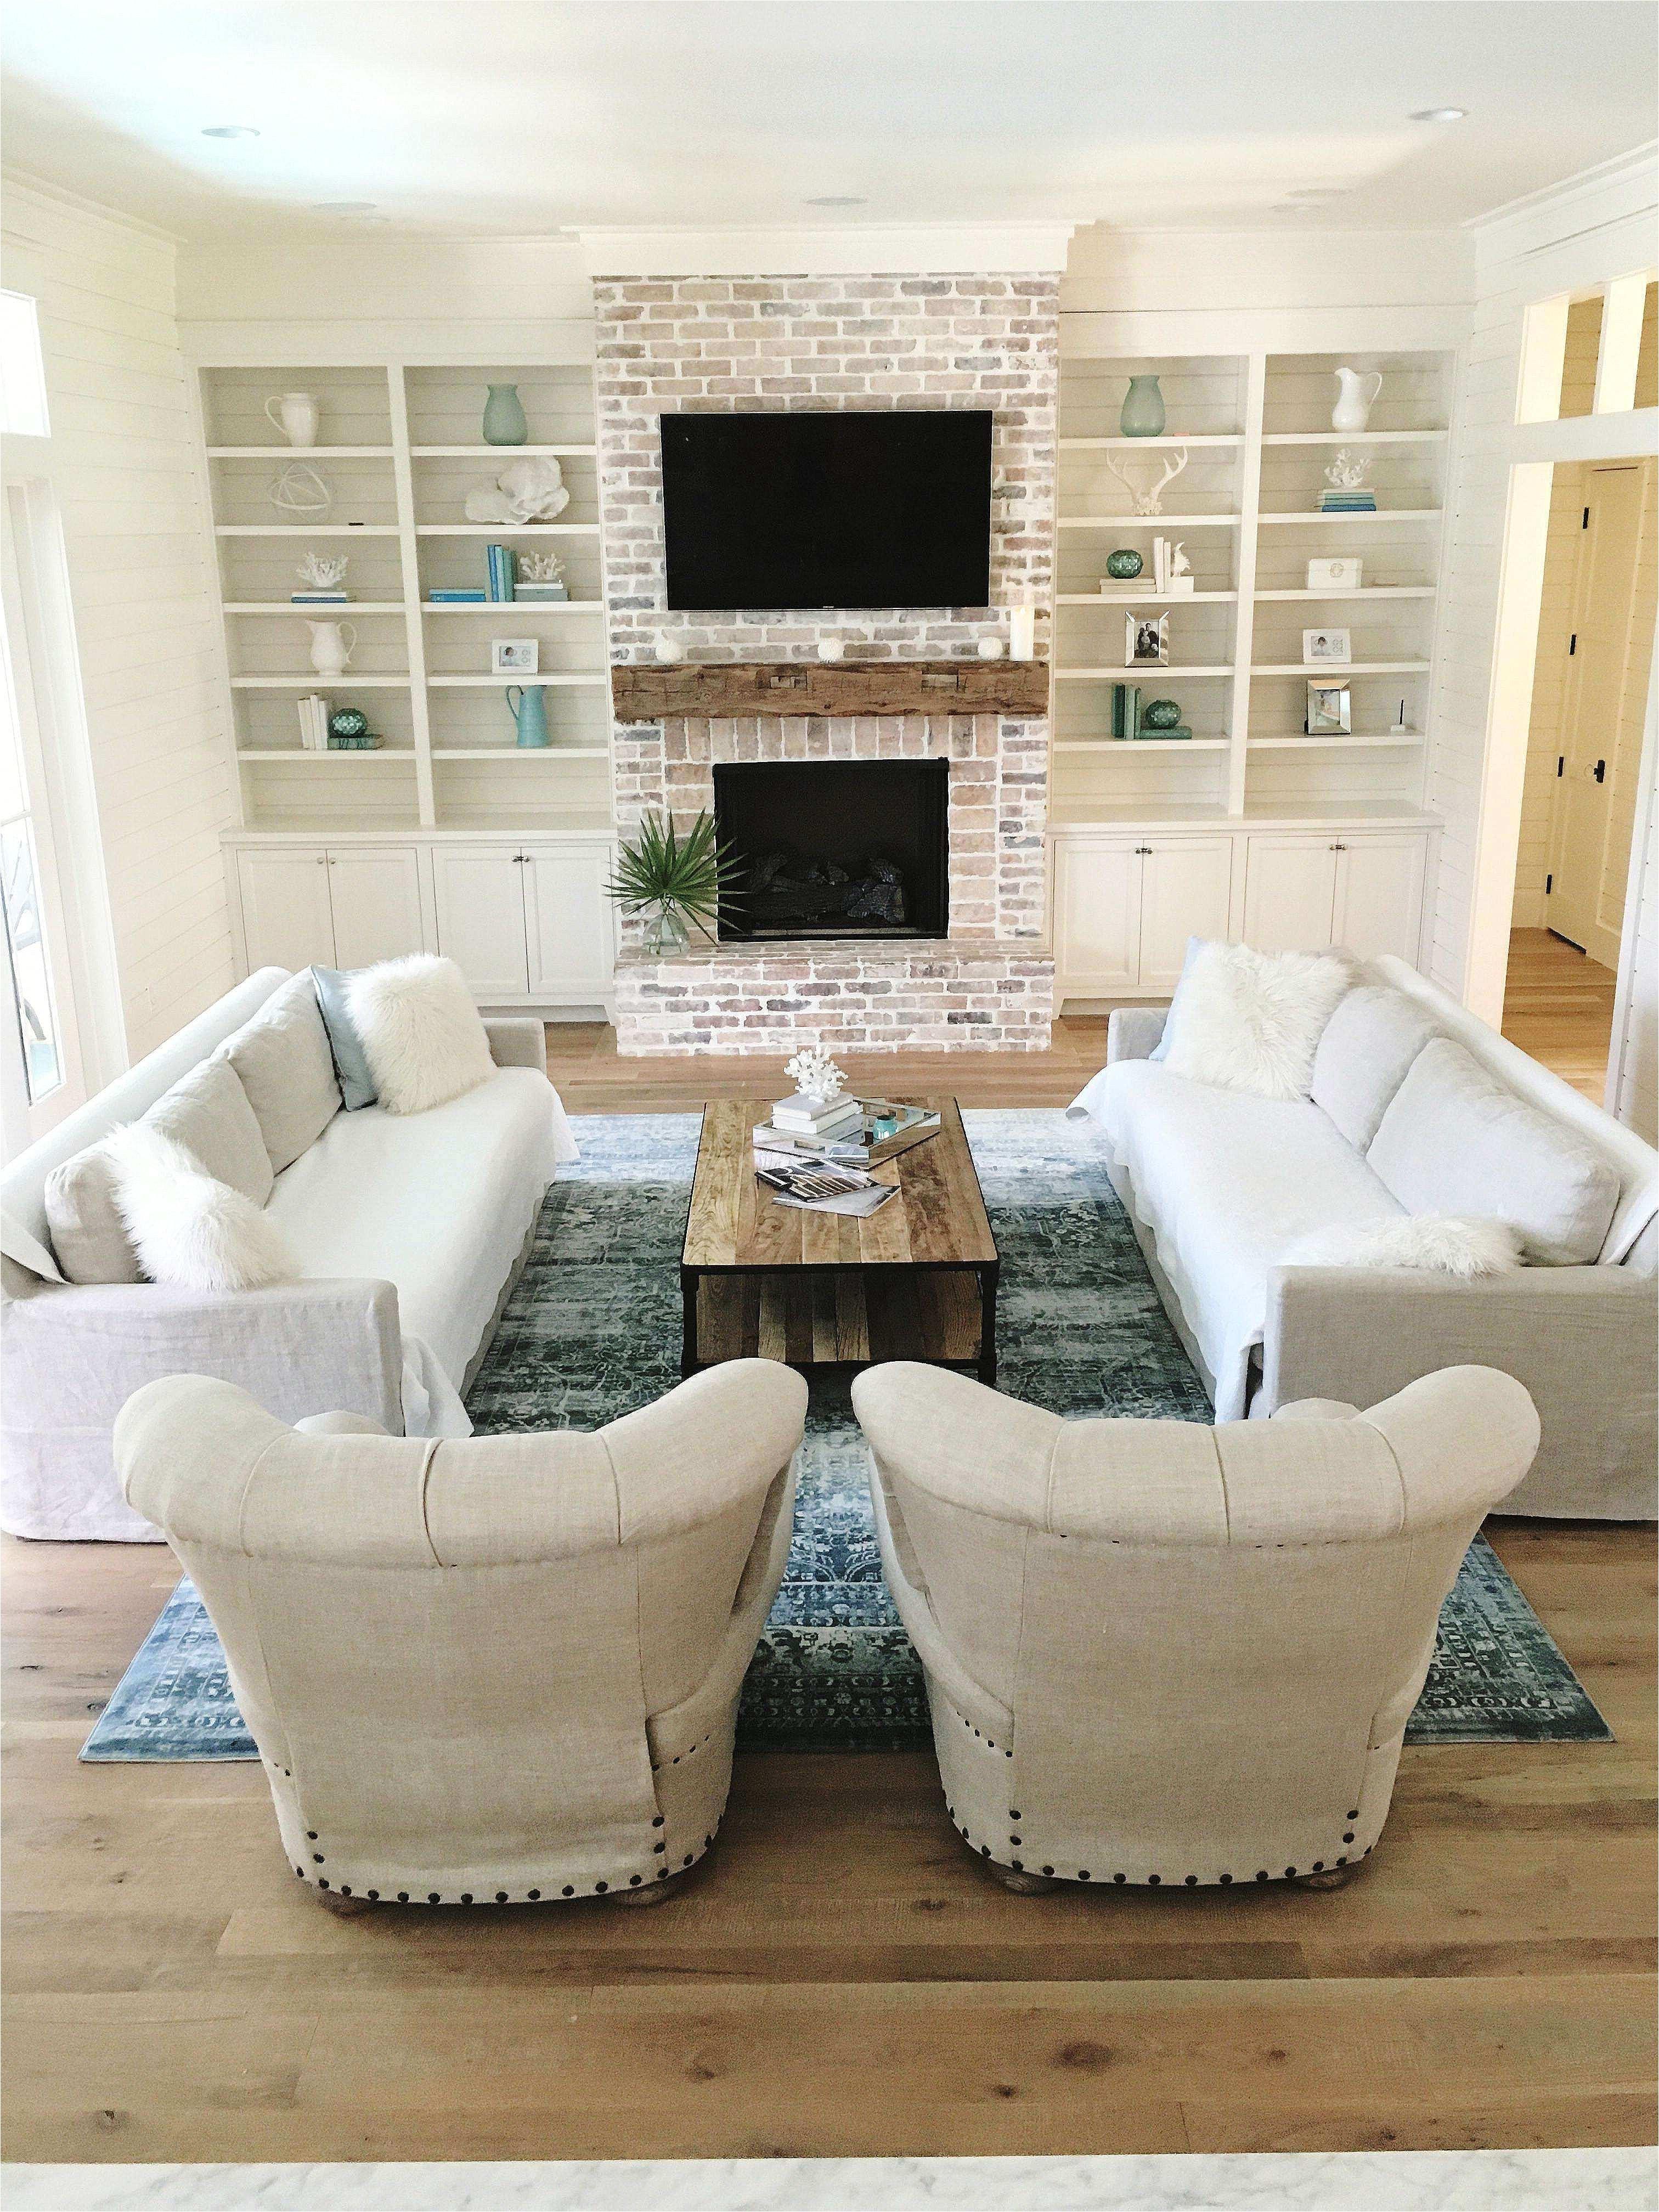 Simple Rustic Home Decor Elegant 31 Fresh Modern House Decor Ideas